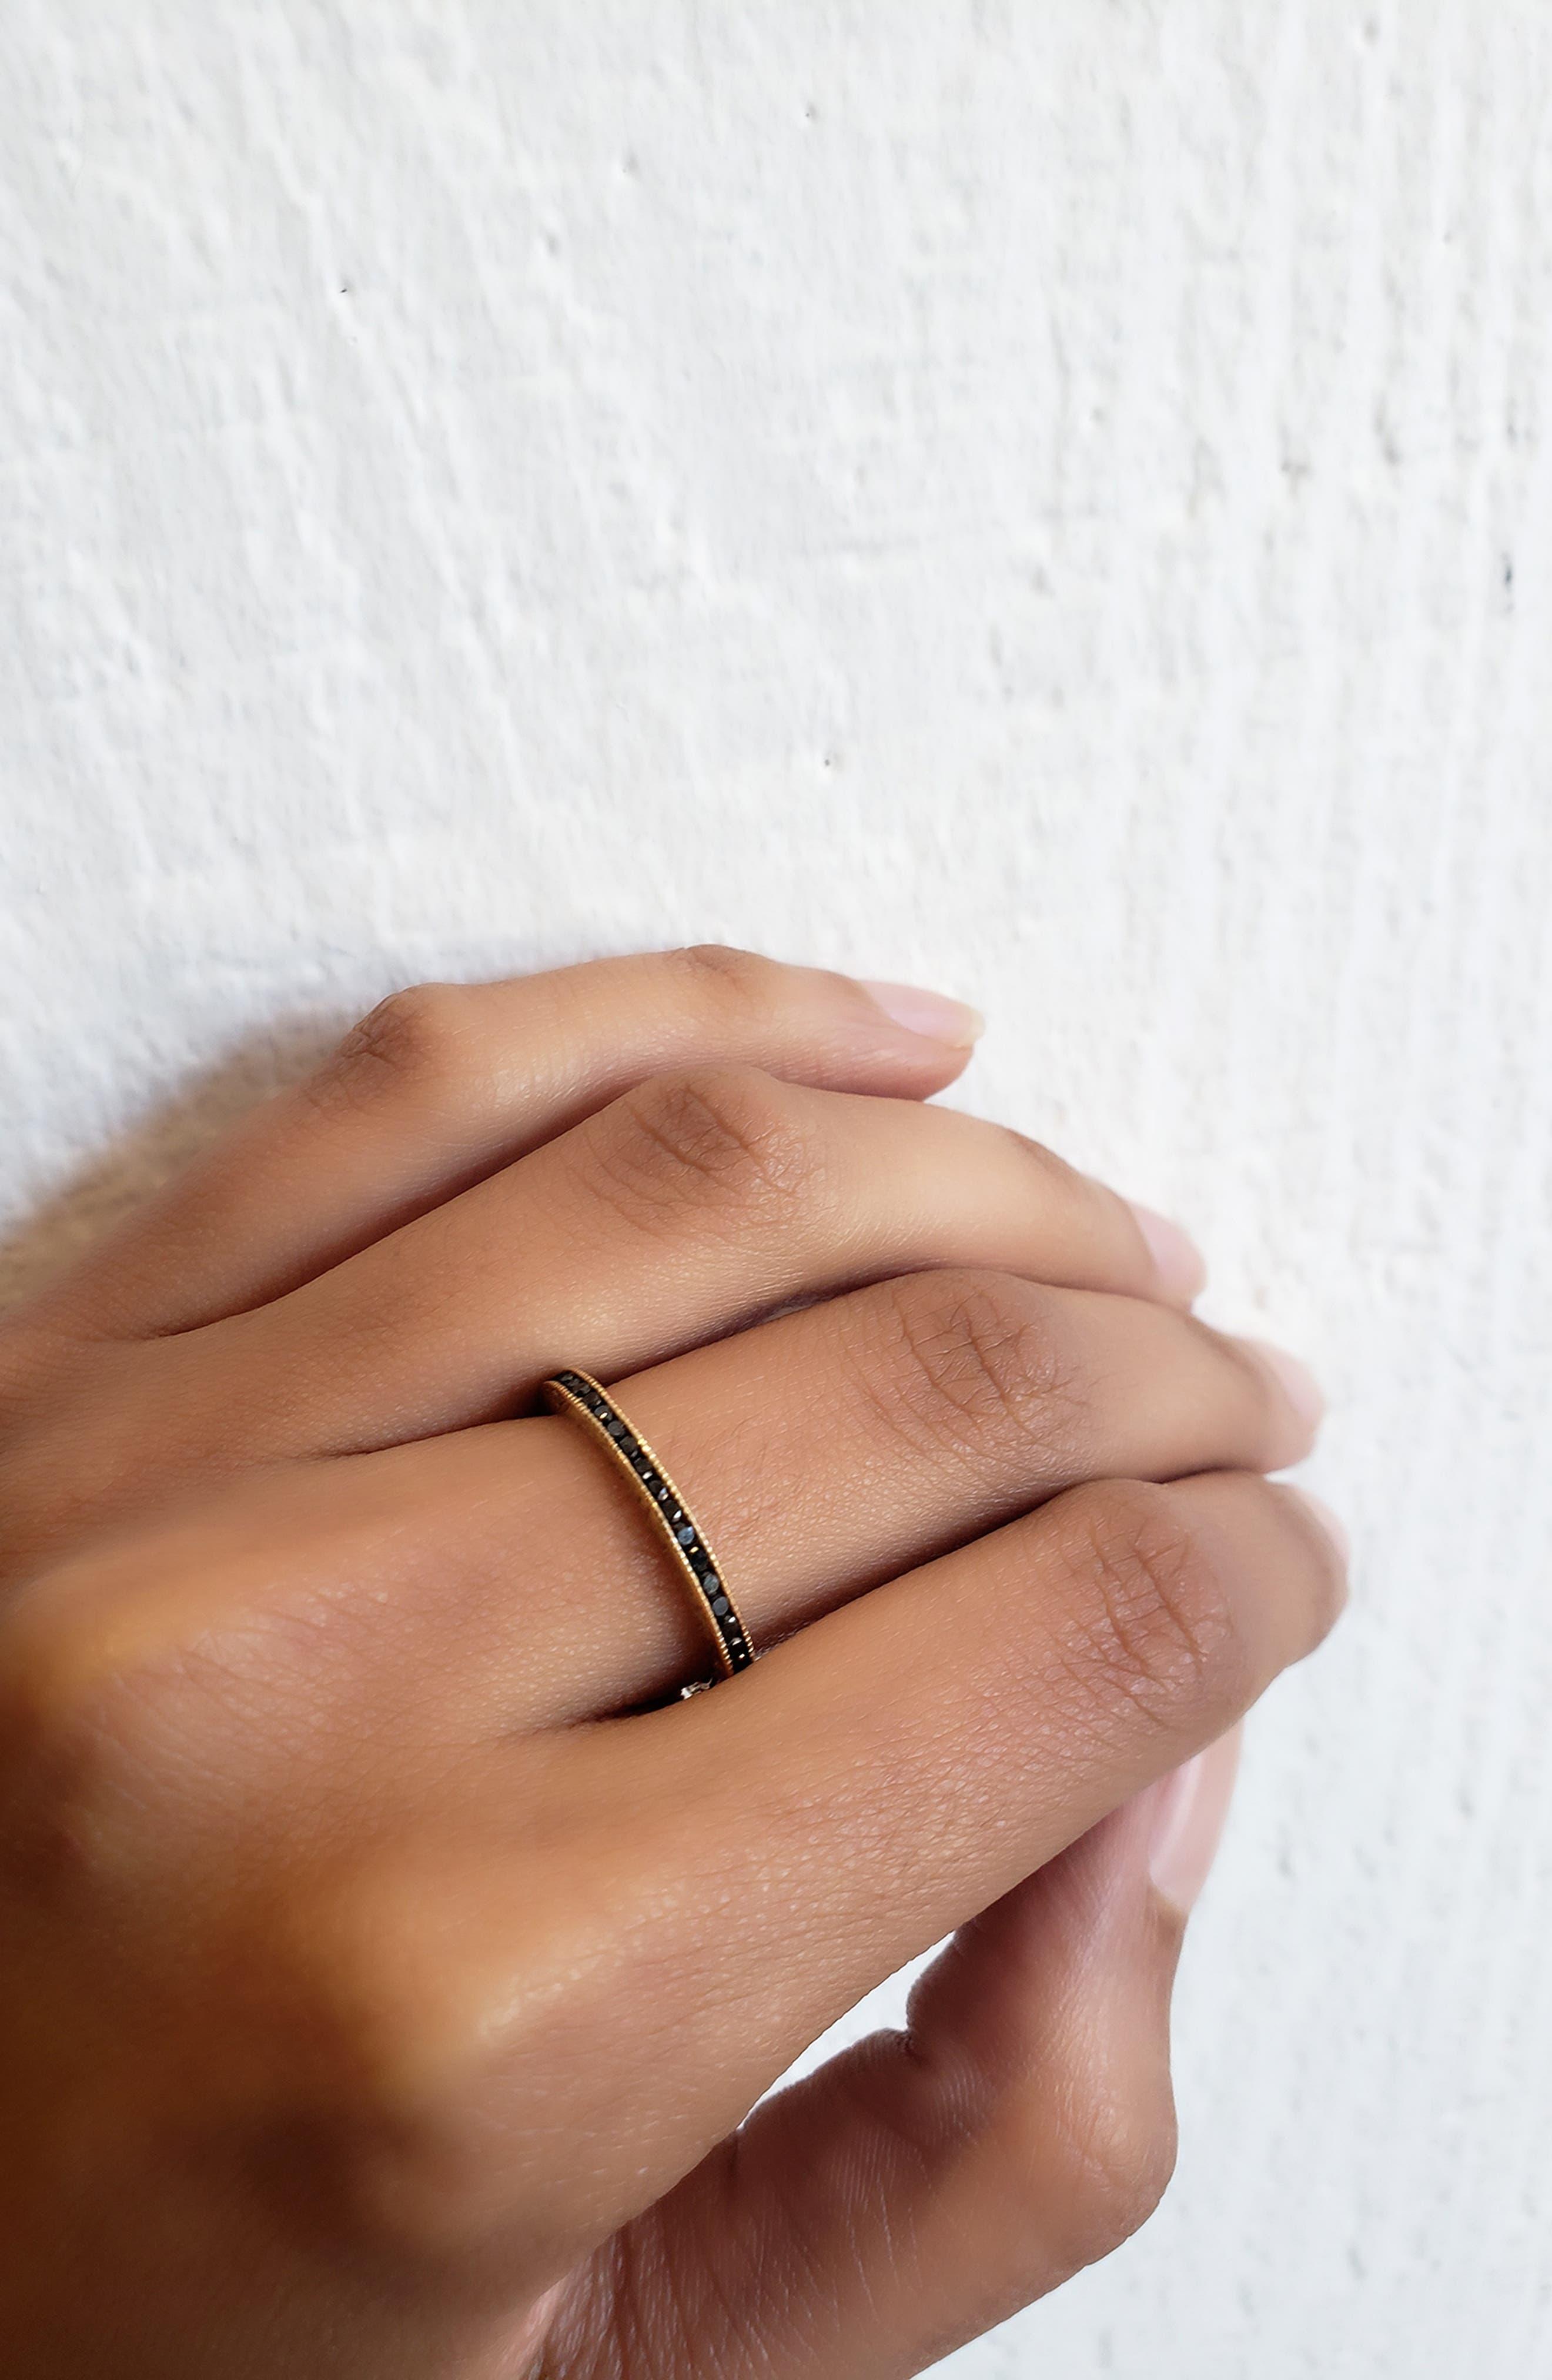 Channel Set Diamond Ring,                             Alternate thumbnail 2, color,                             ROSE GOLD/ BLACK DIAMOND